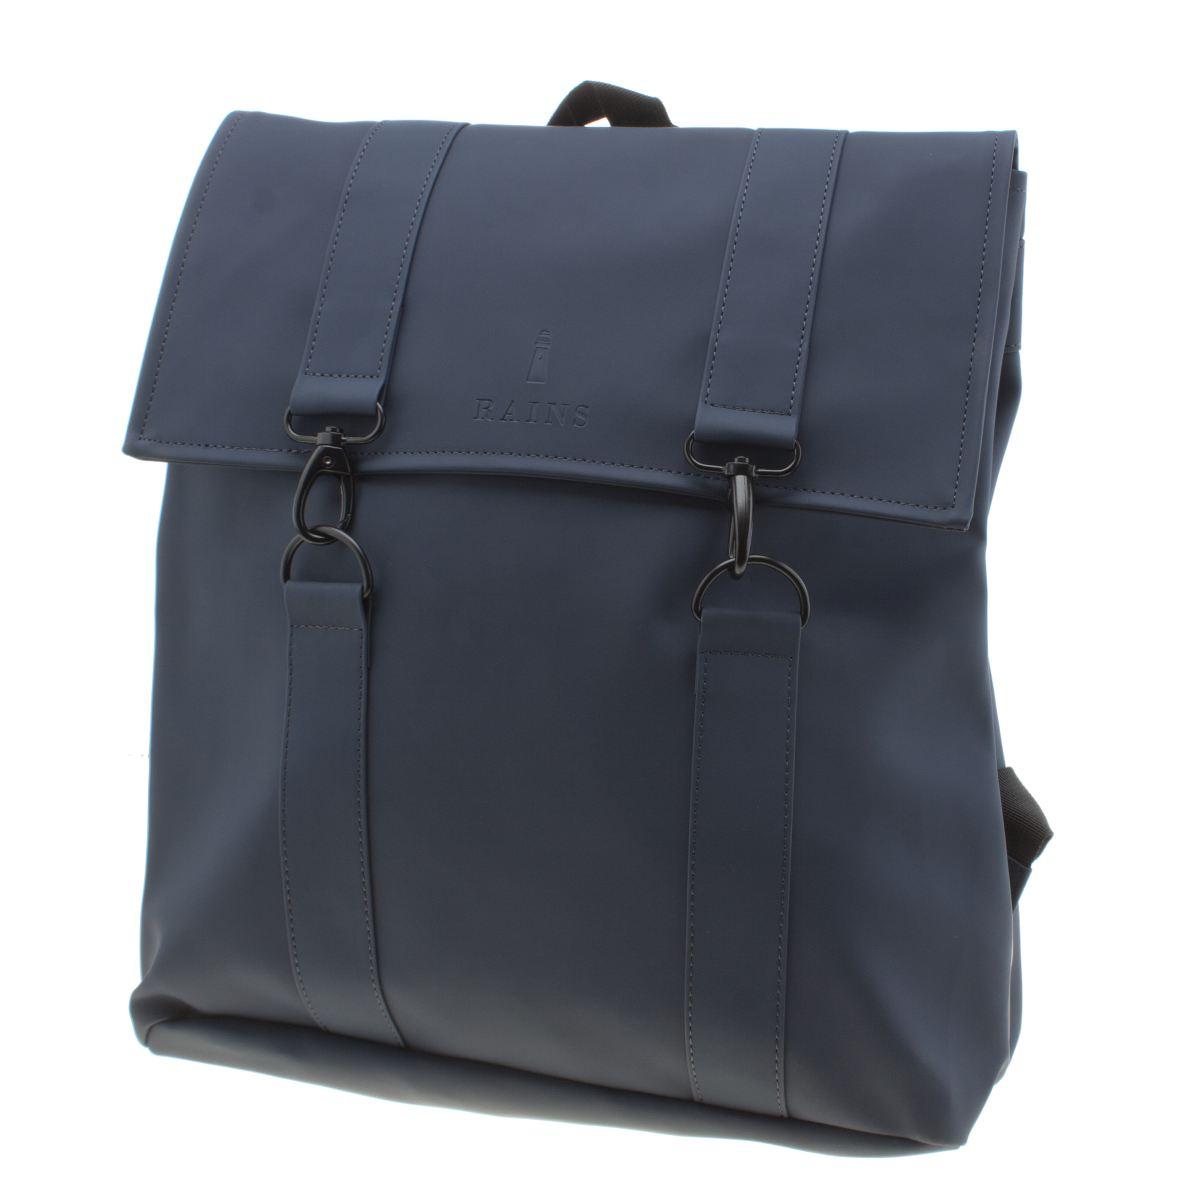 Rains Rains Navy Messenger Bag Bags